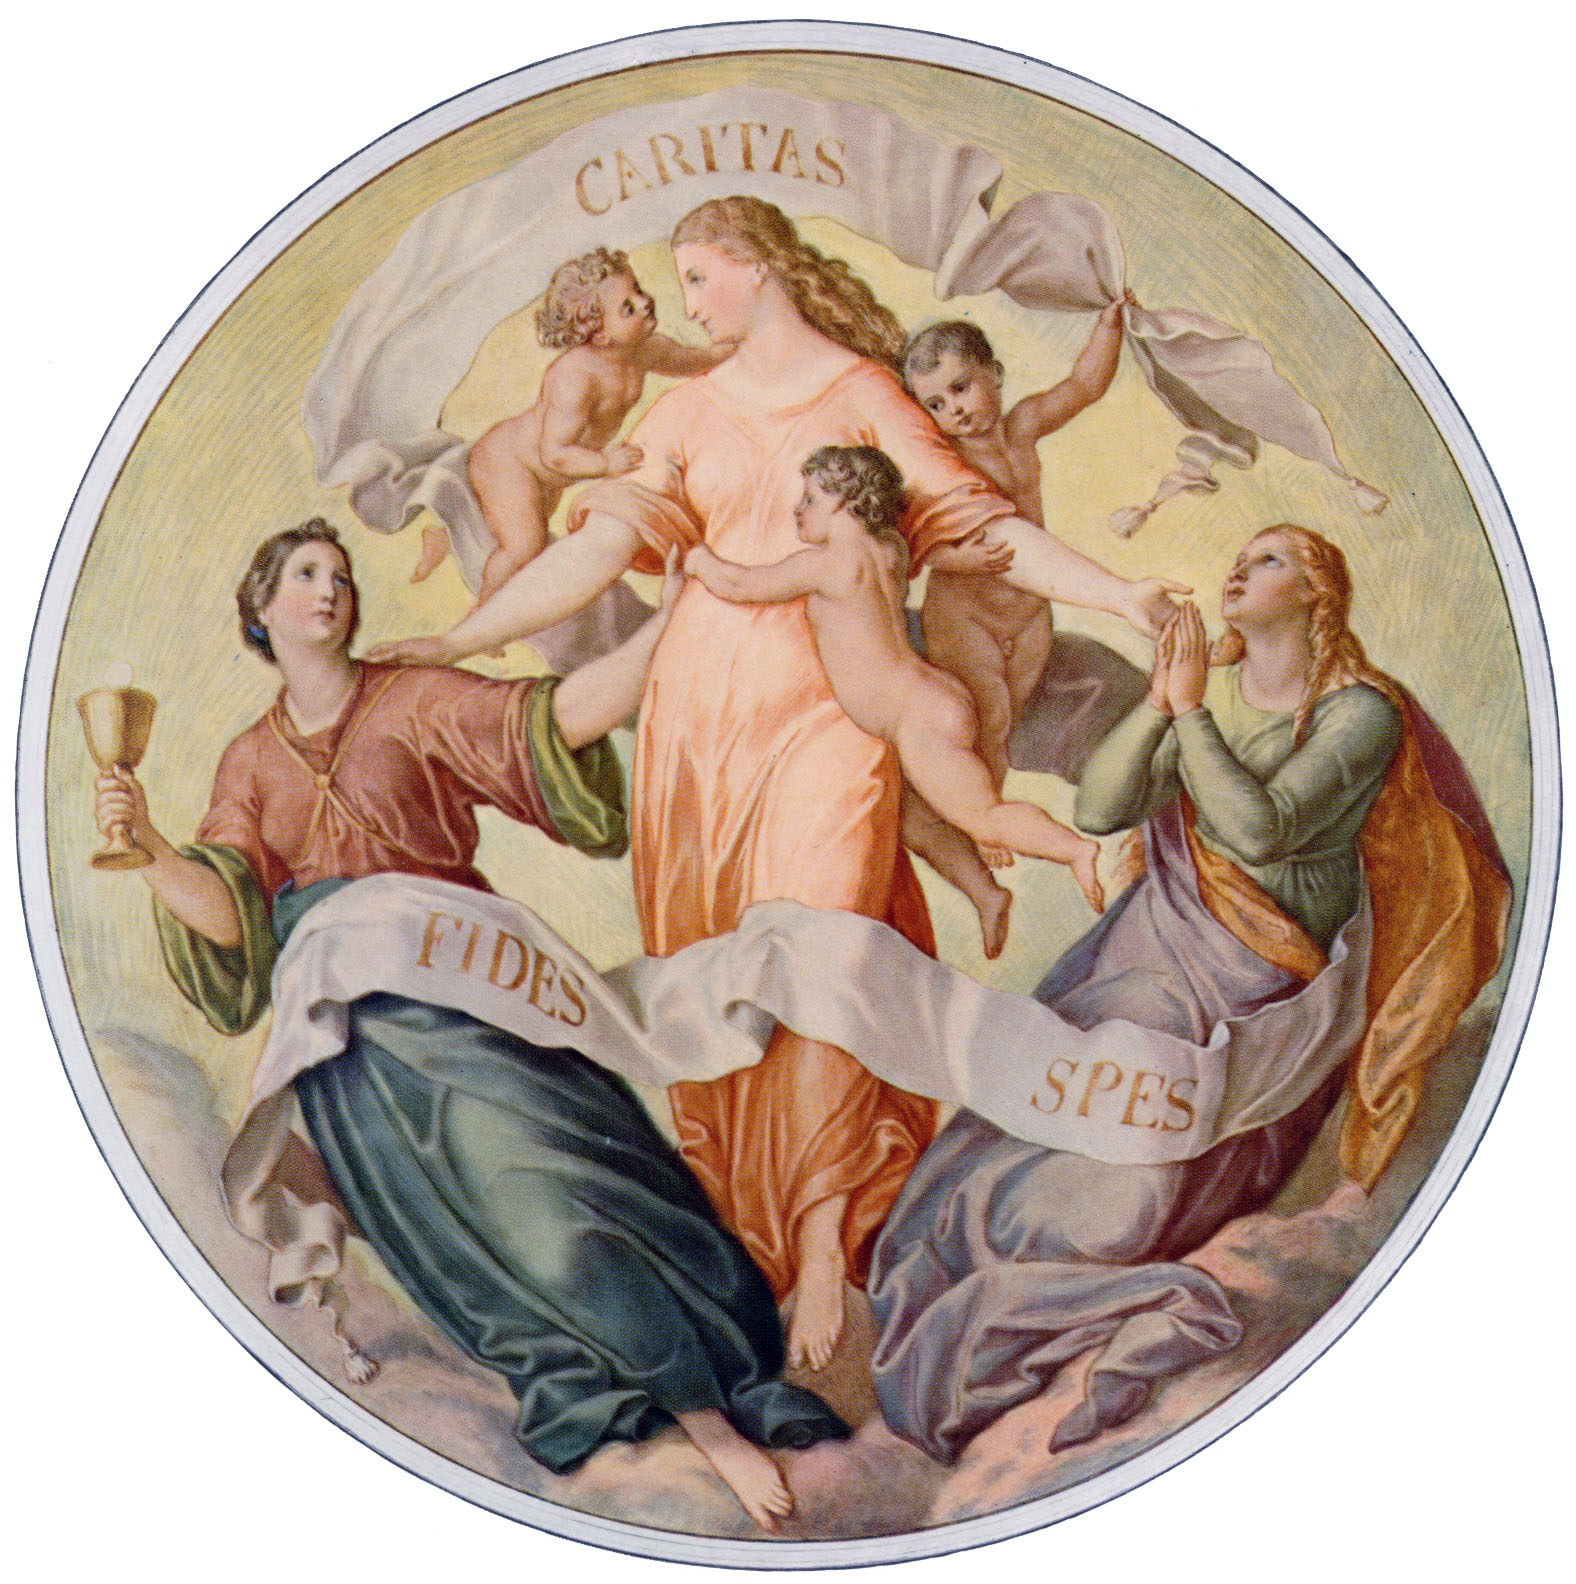 Artwork by: Julius Schnorr von Carolsfeld.  Fides, Spes, et Caritas.  Photographer: Velhagen & Klasing, Bielefeld. 1911. This artwork is in the Public Domain. {{ PD-US }}